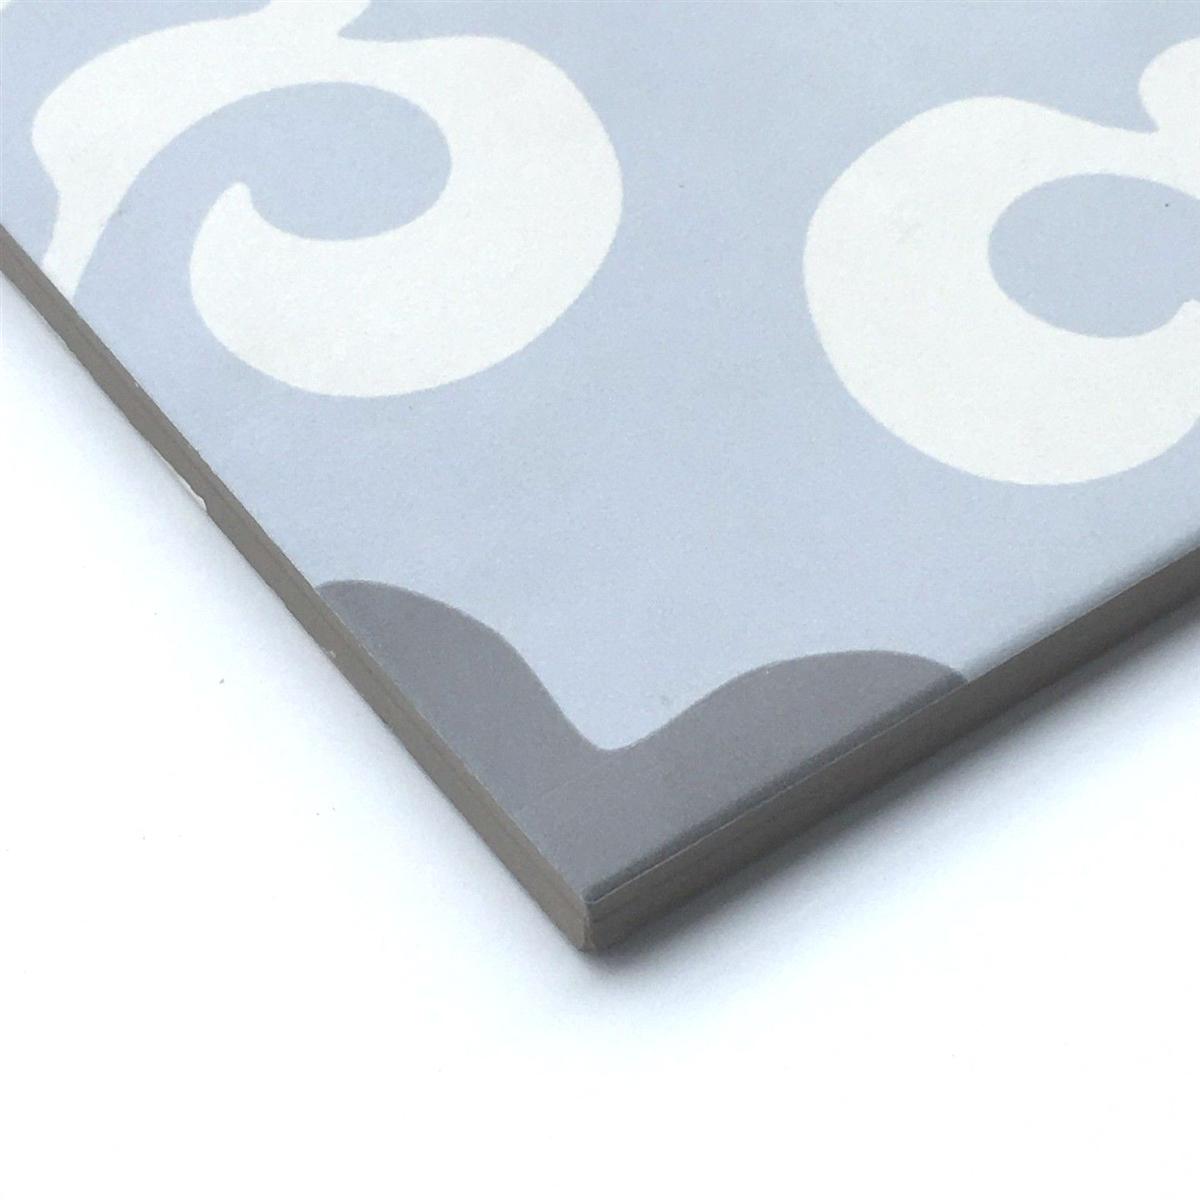 8x8 Parisienne Bleu Porcelain Patterned Floor Tile